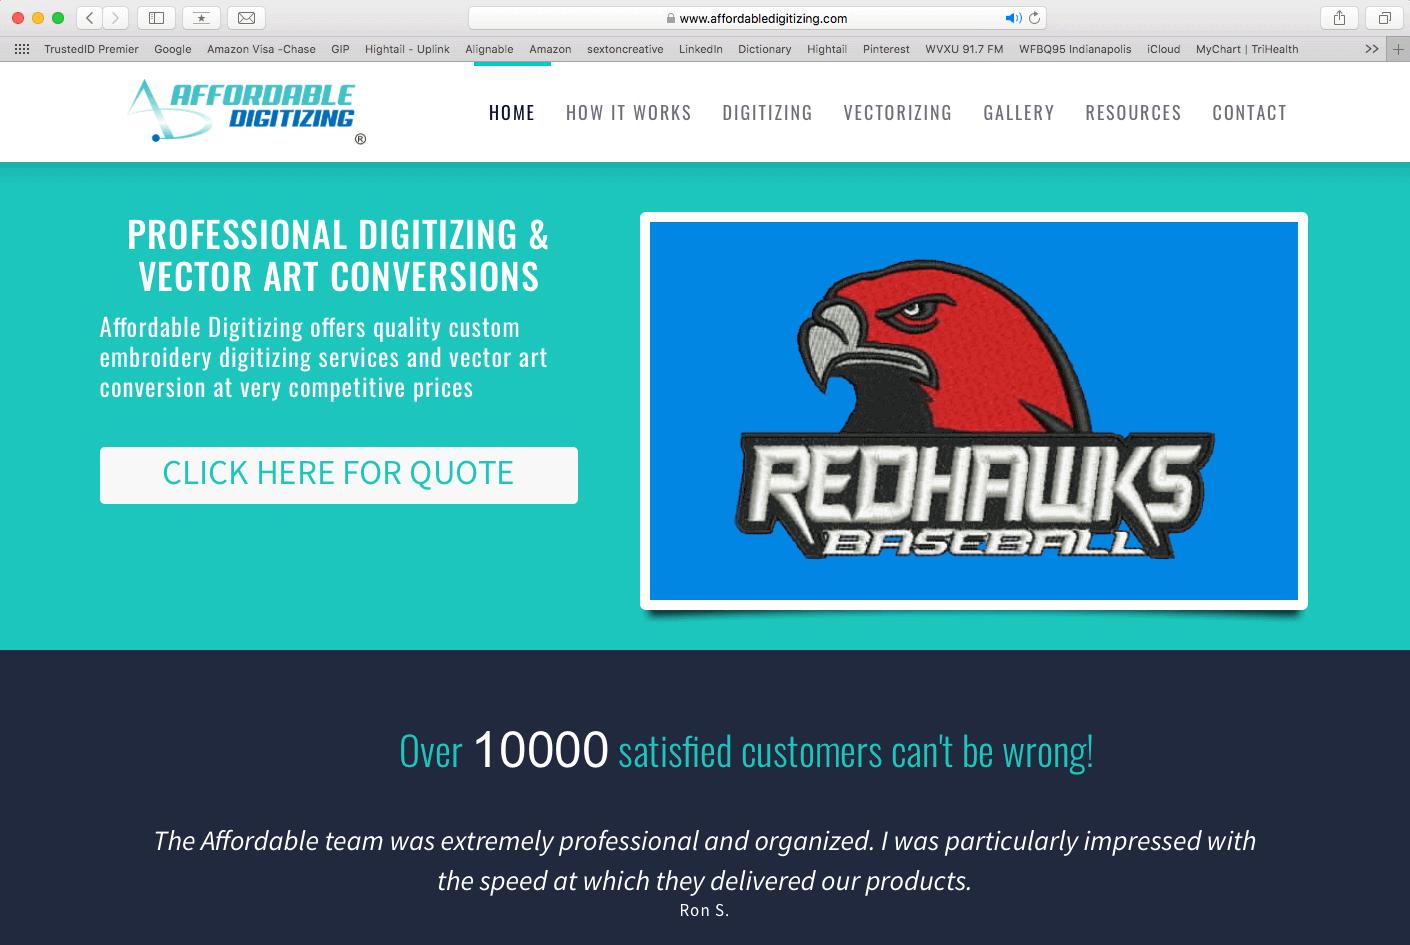 affordabledigitizing.com